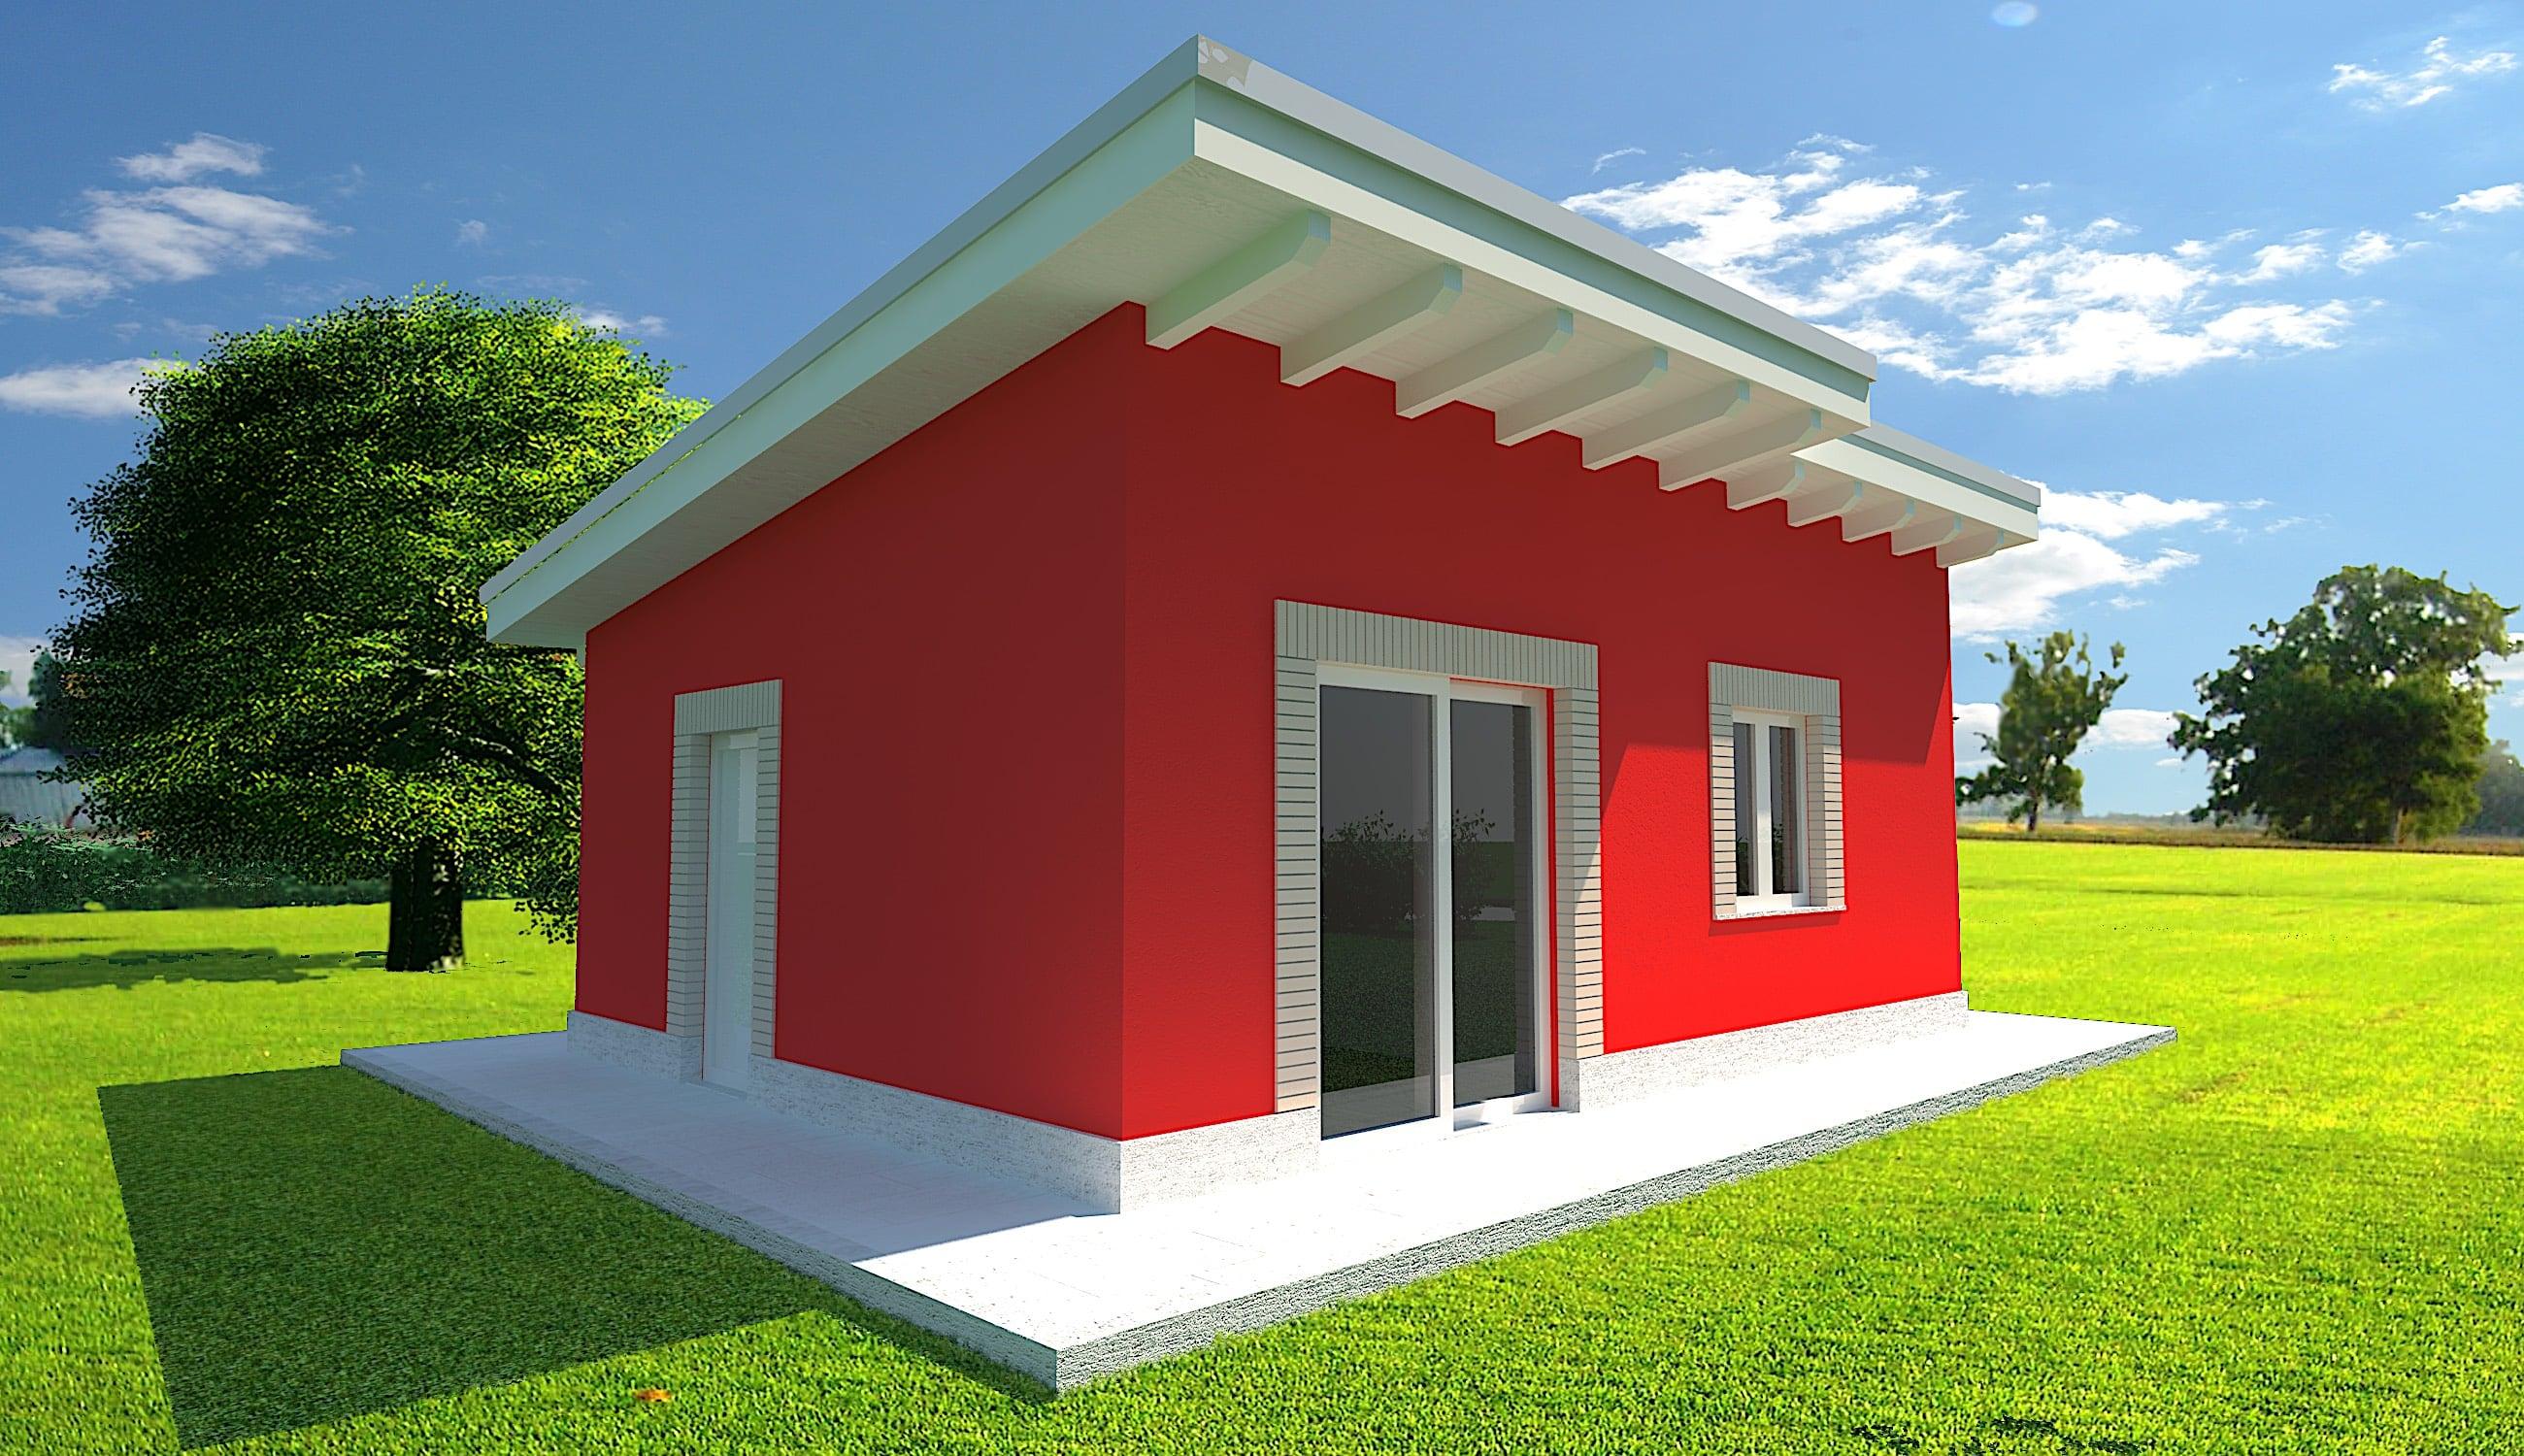 Case Moderne Prefabbricate : Avantgarde construct luxury case prefabbricate ville in legno